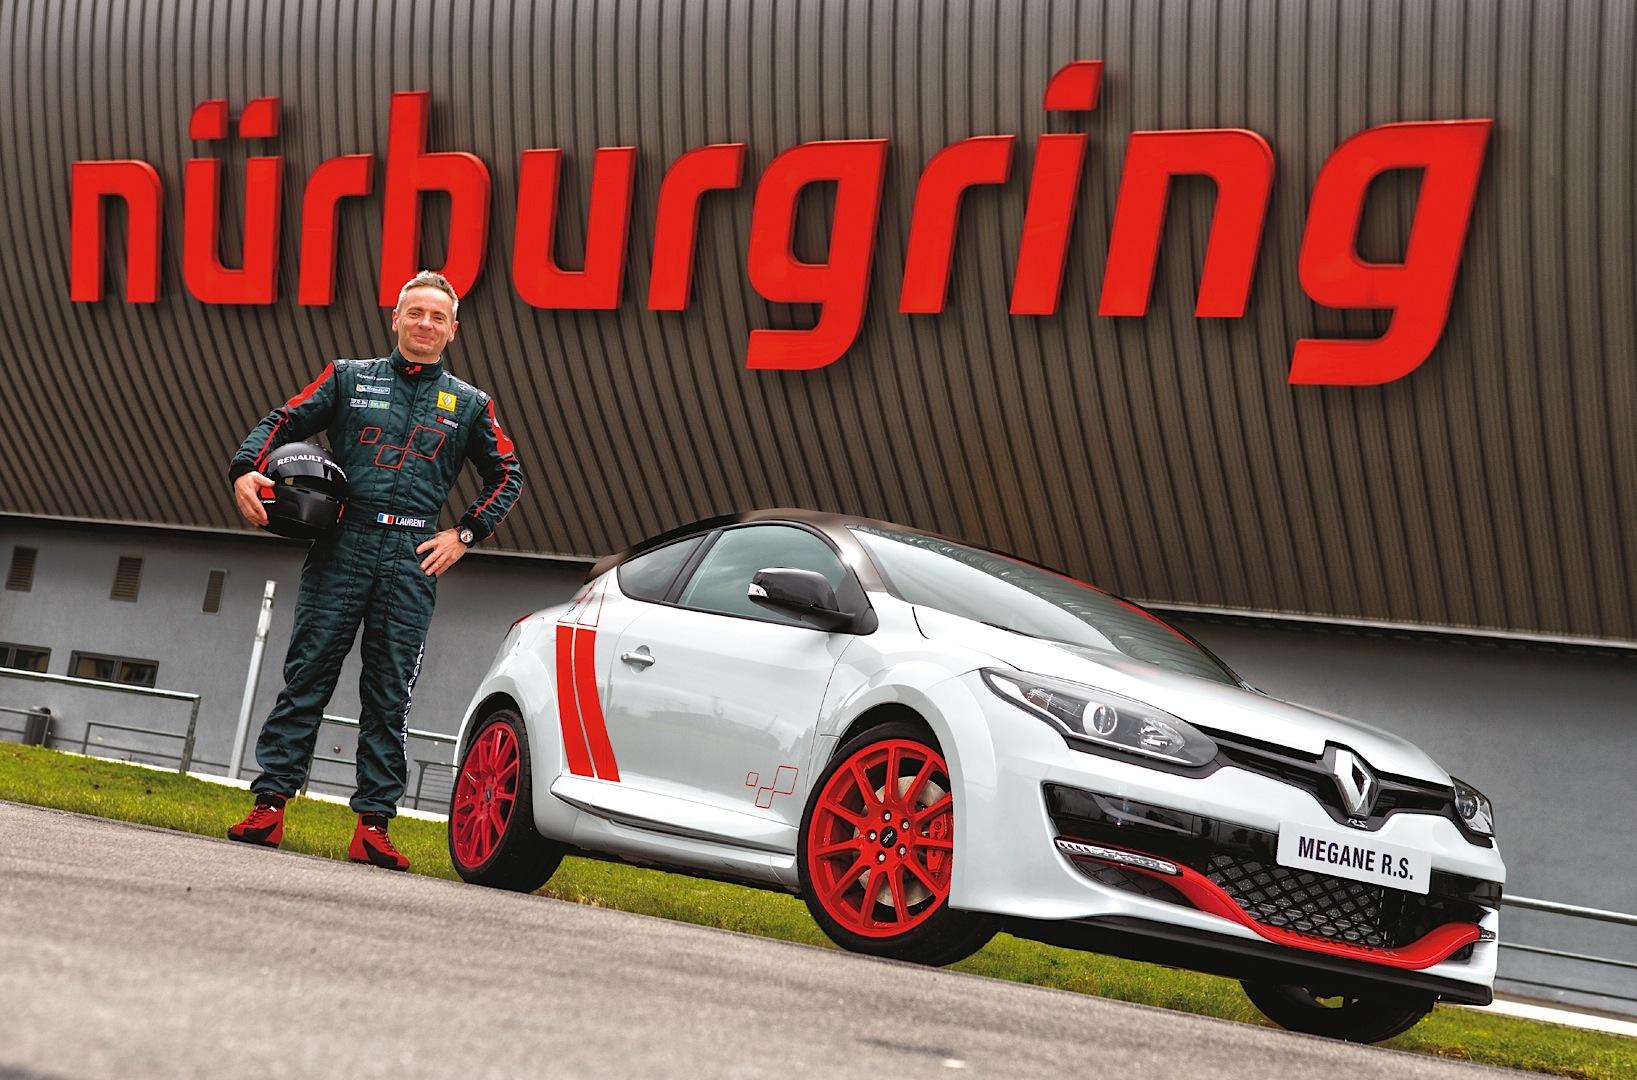 renault-megane-rs-275-trophy-r-sets-new-nurburgring-lap-record-75436_29